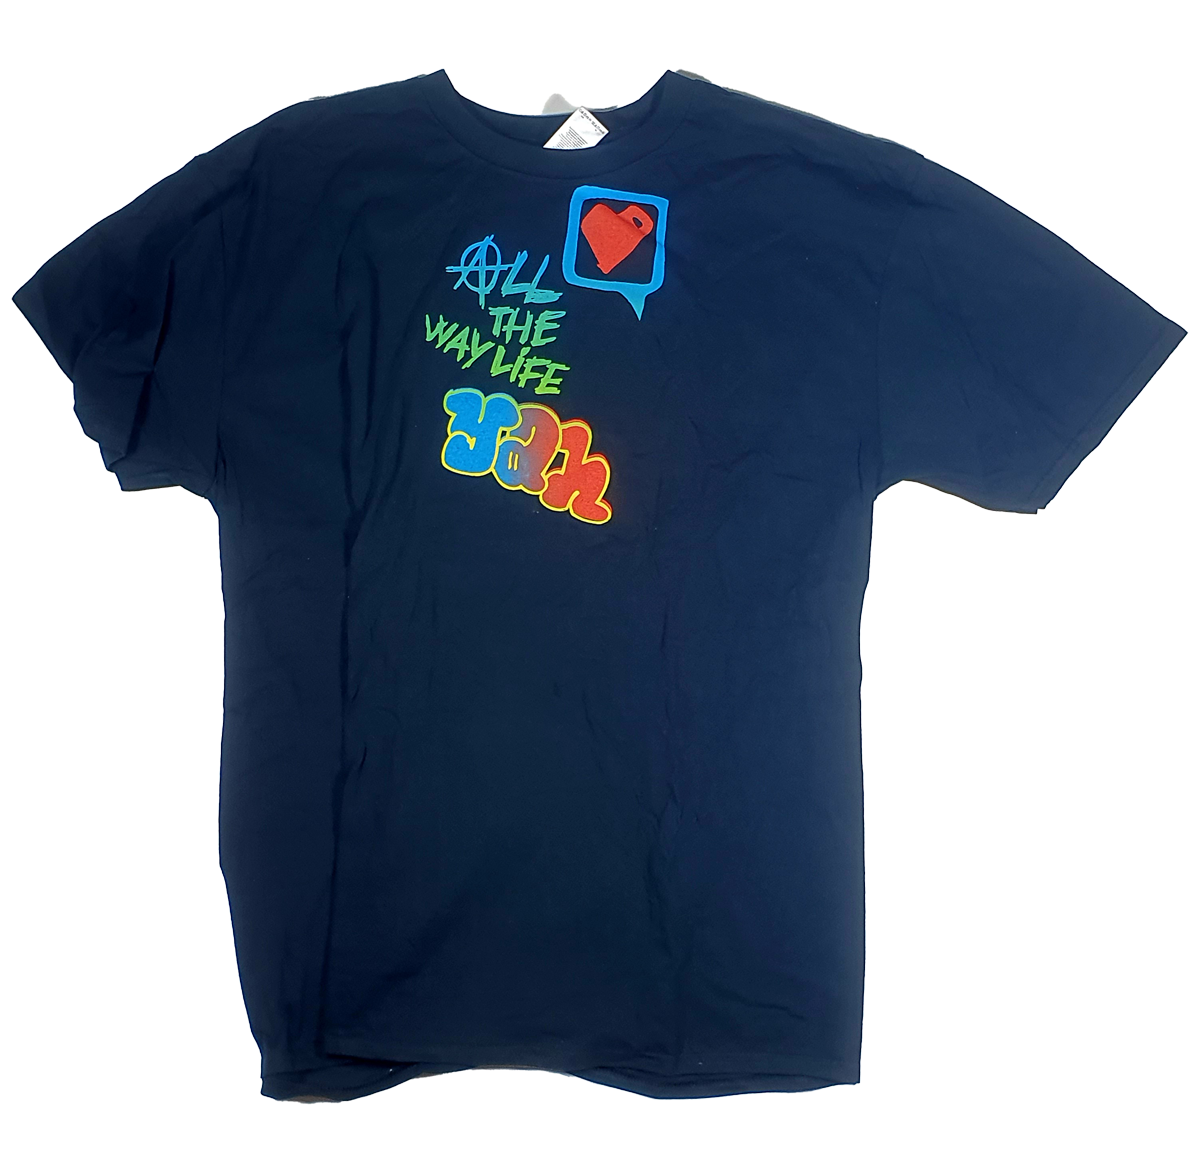 YAH – All the way life T-Shirt